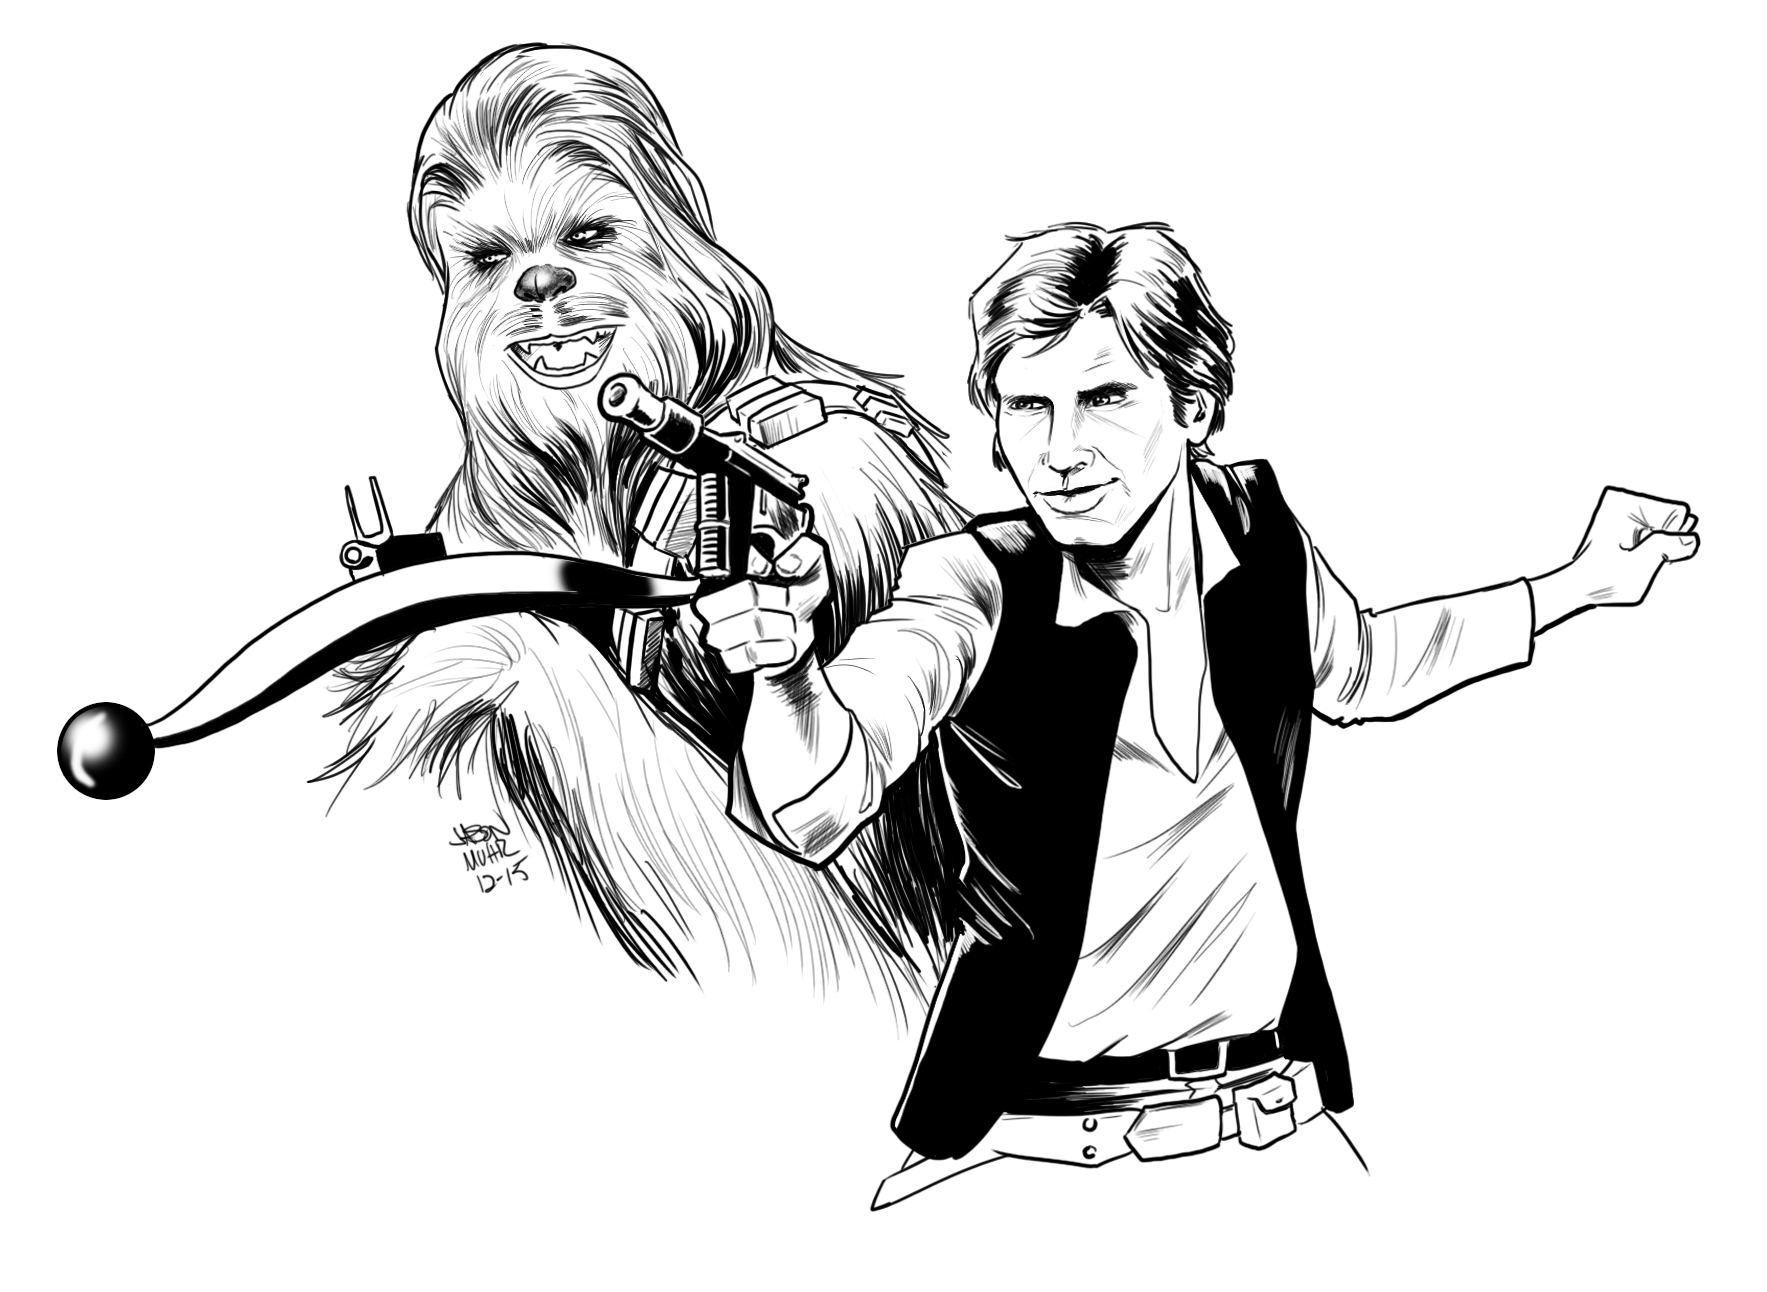 Han_Solo_&_chewbacca_jason_muhr.jpg